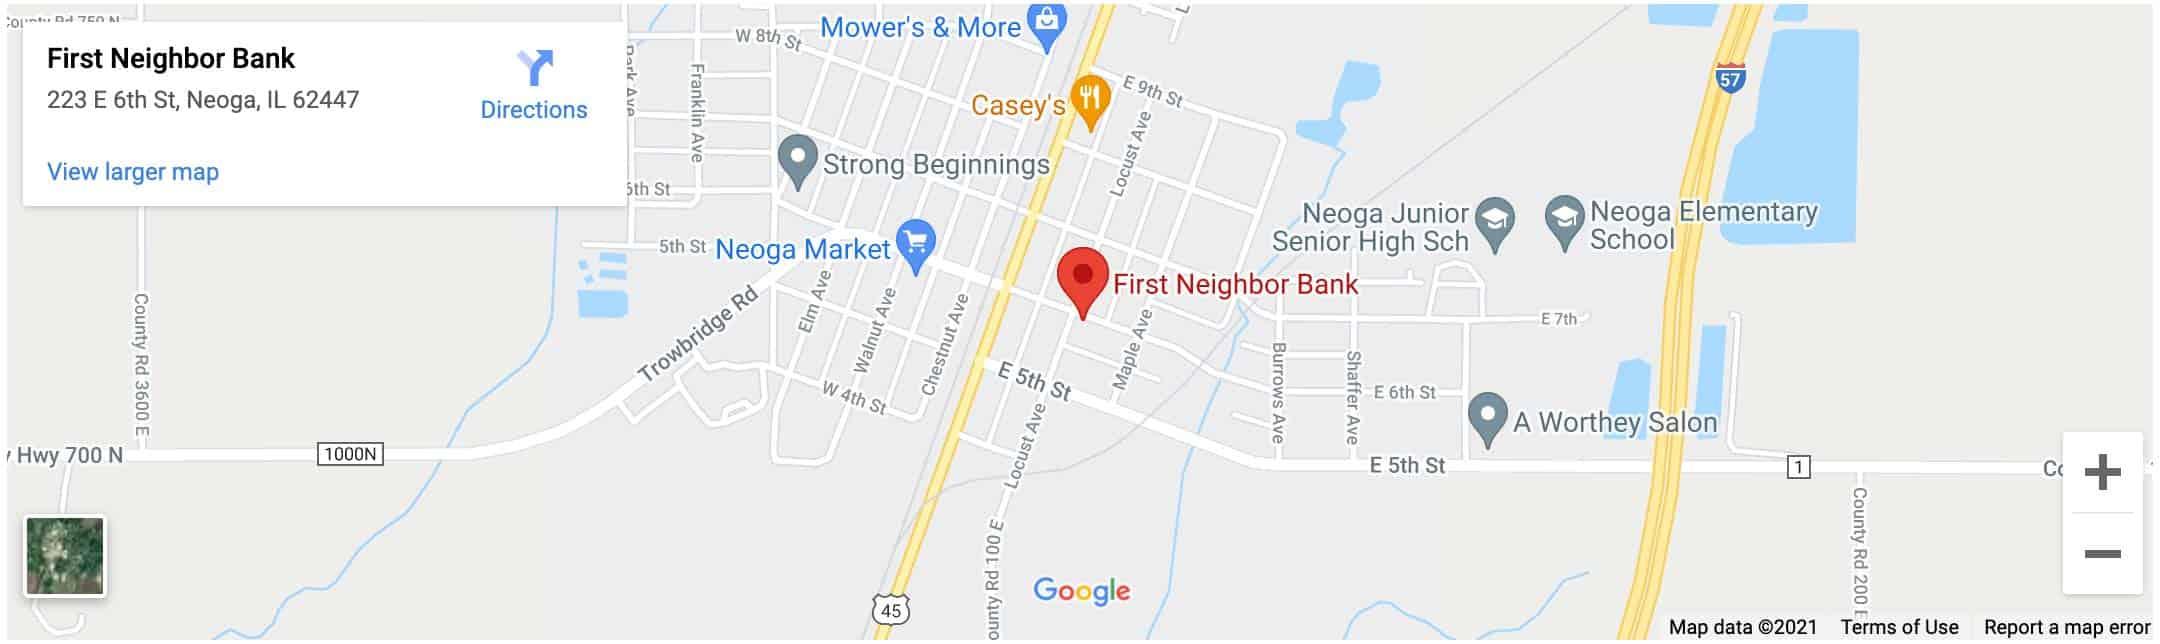 Decorative - First Neighbor Bank Neoga Google Map Image